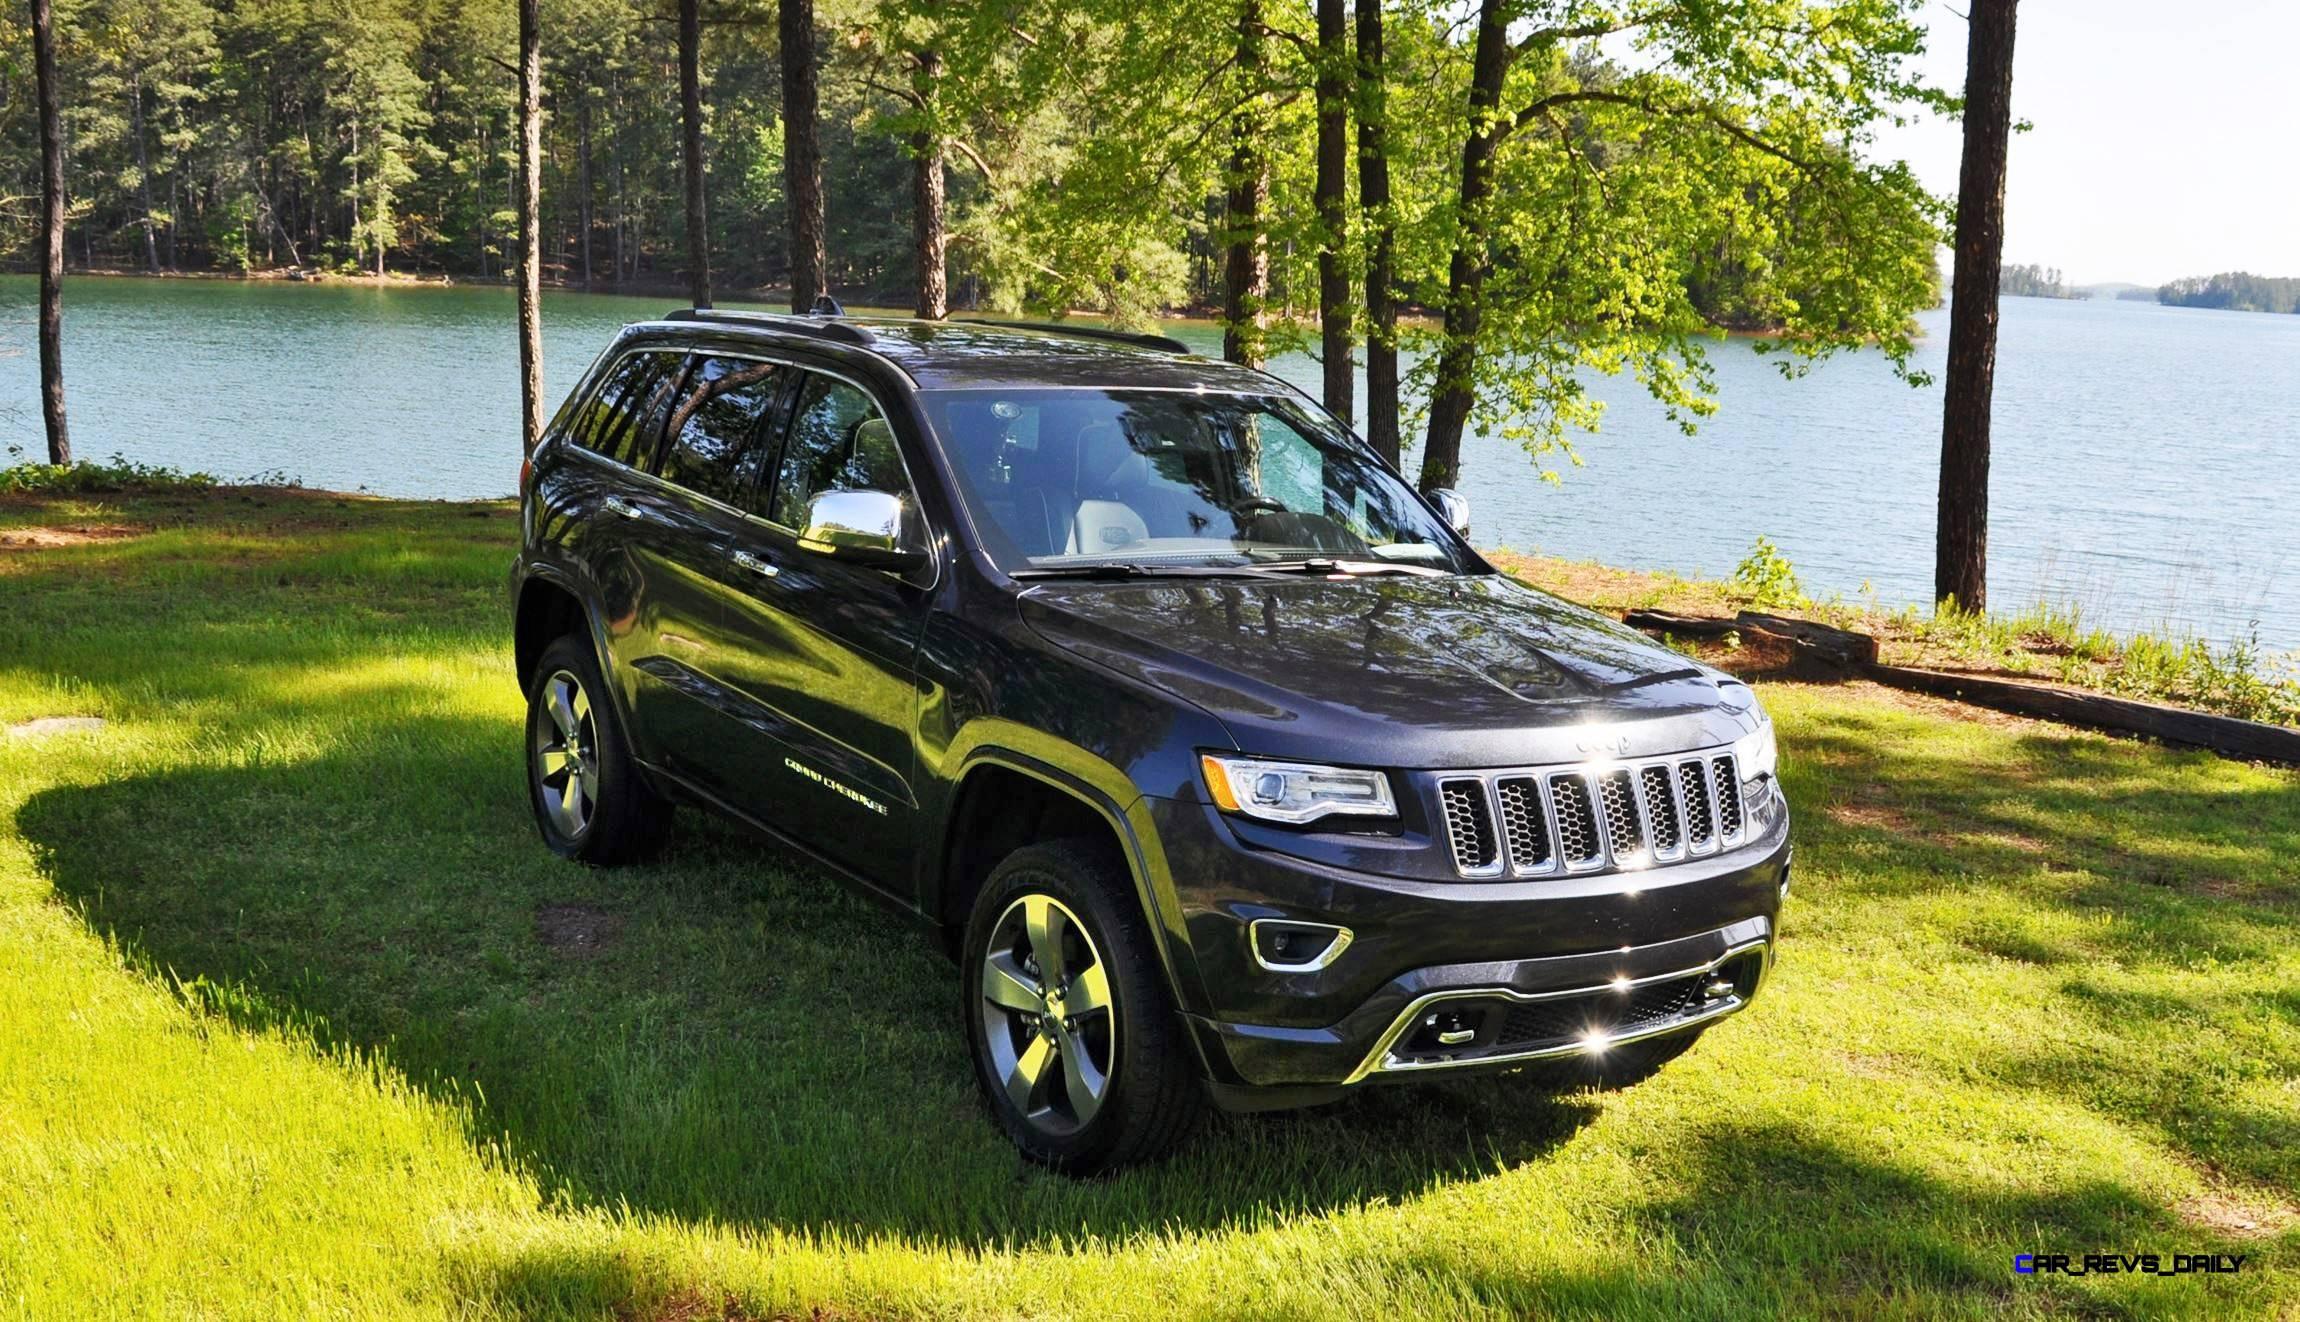 2015 jeep grand cherokee ecodiesel 32. Black Bedroom Furniture Sets. Home Design Ideas